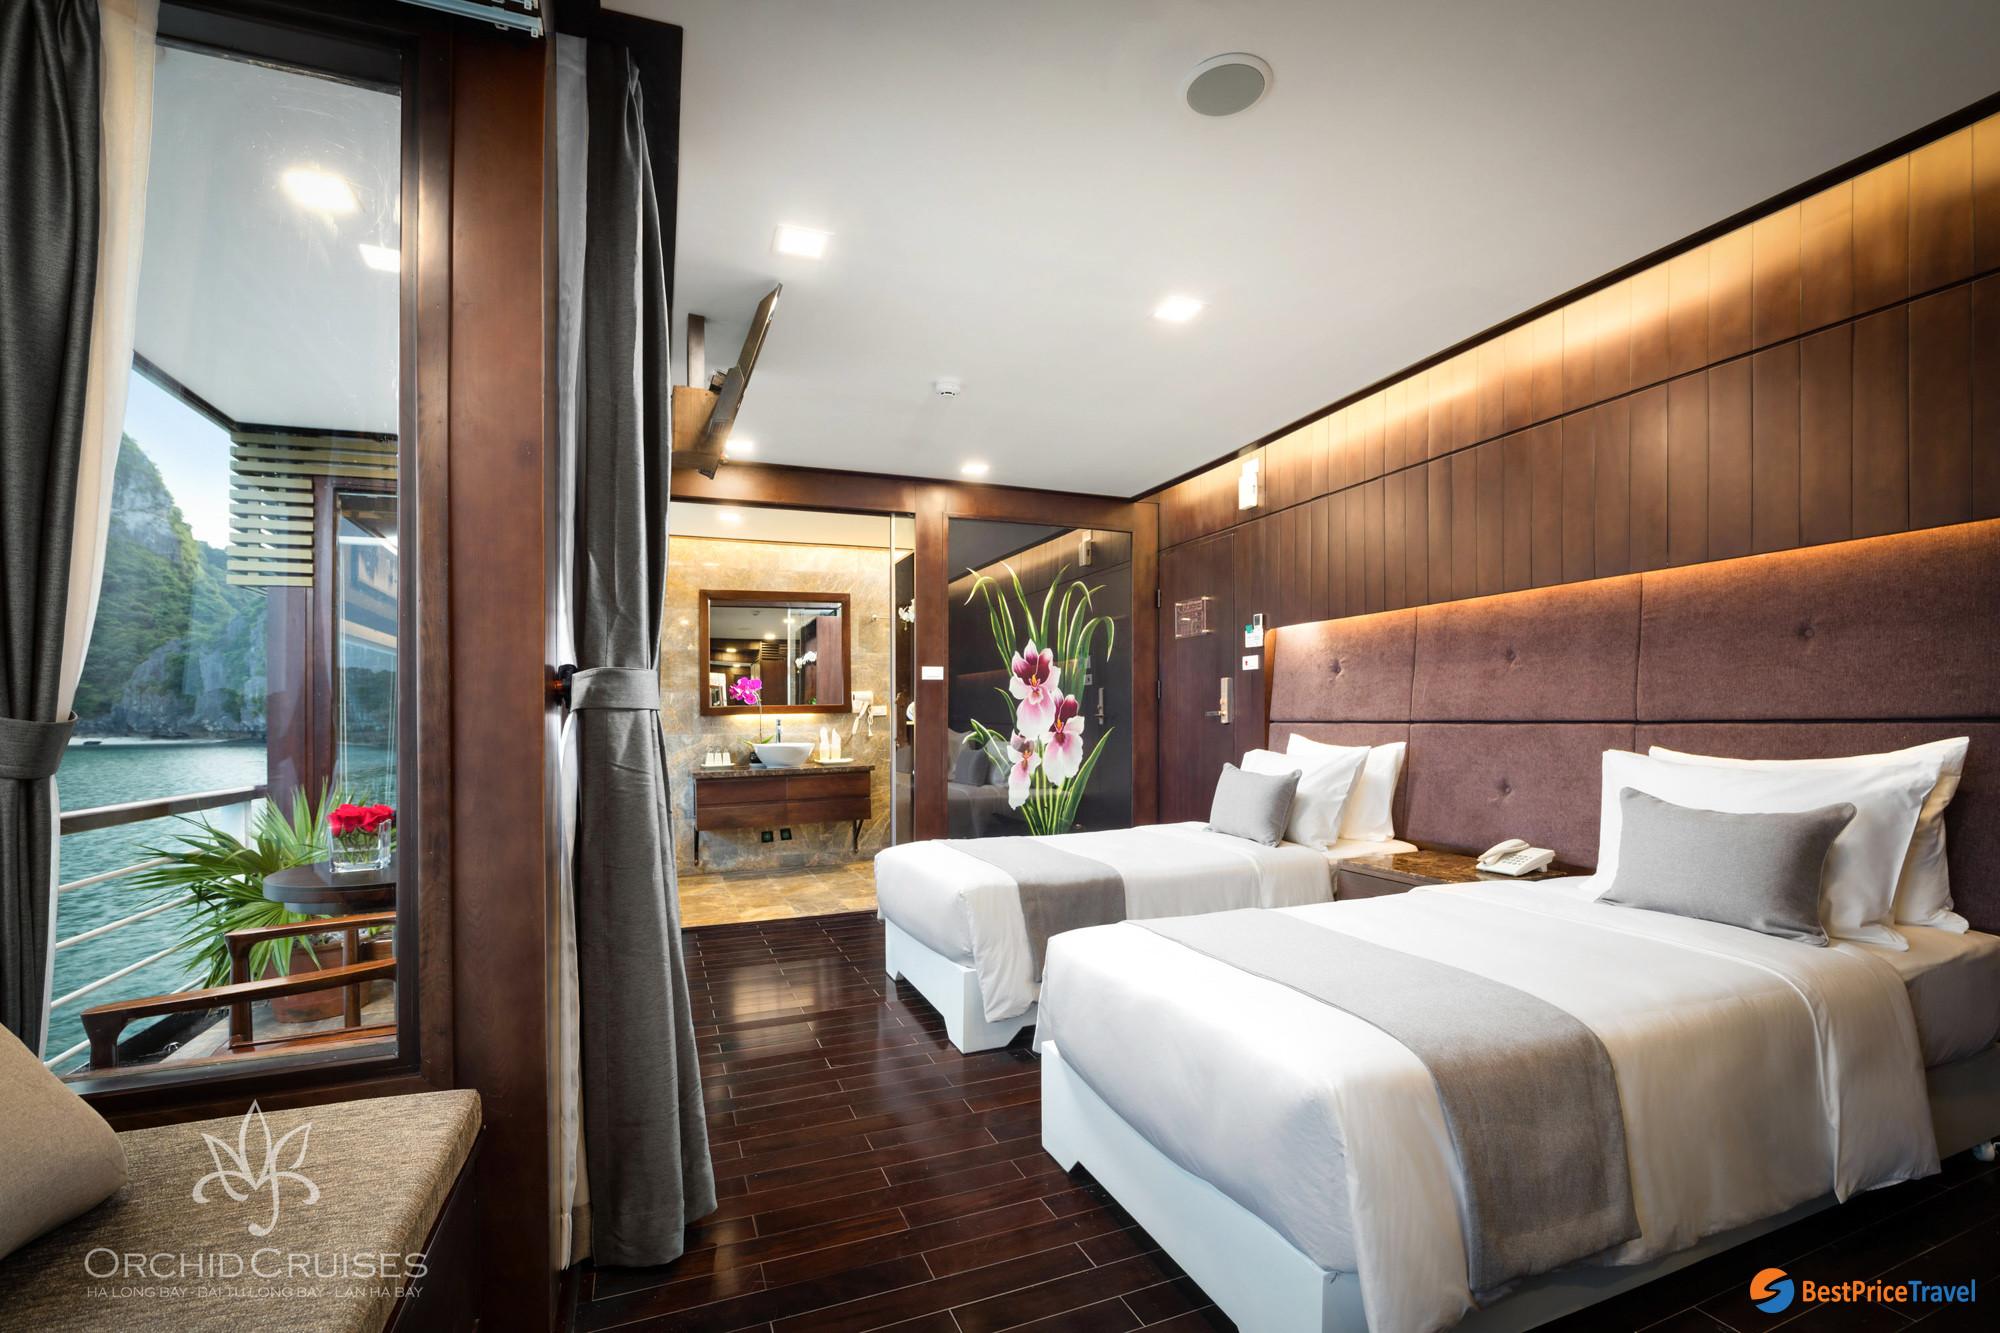 Premium Suite balcony on Orchid Cruise